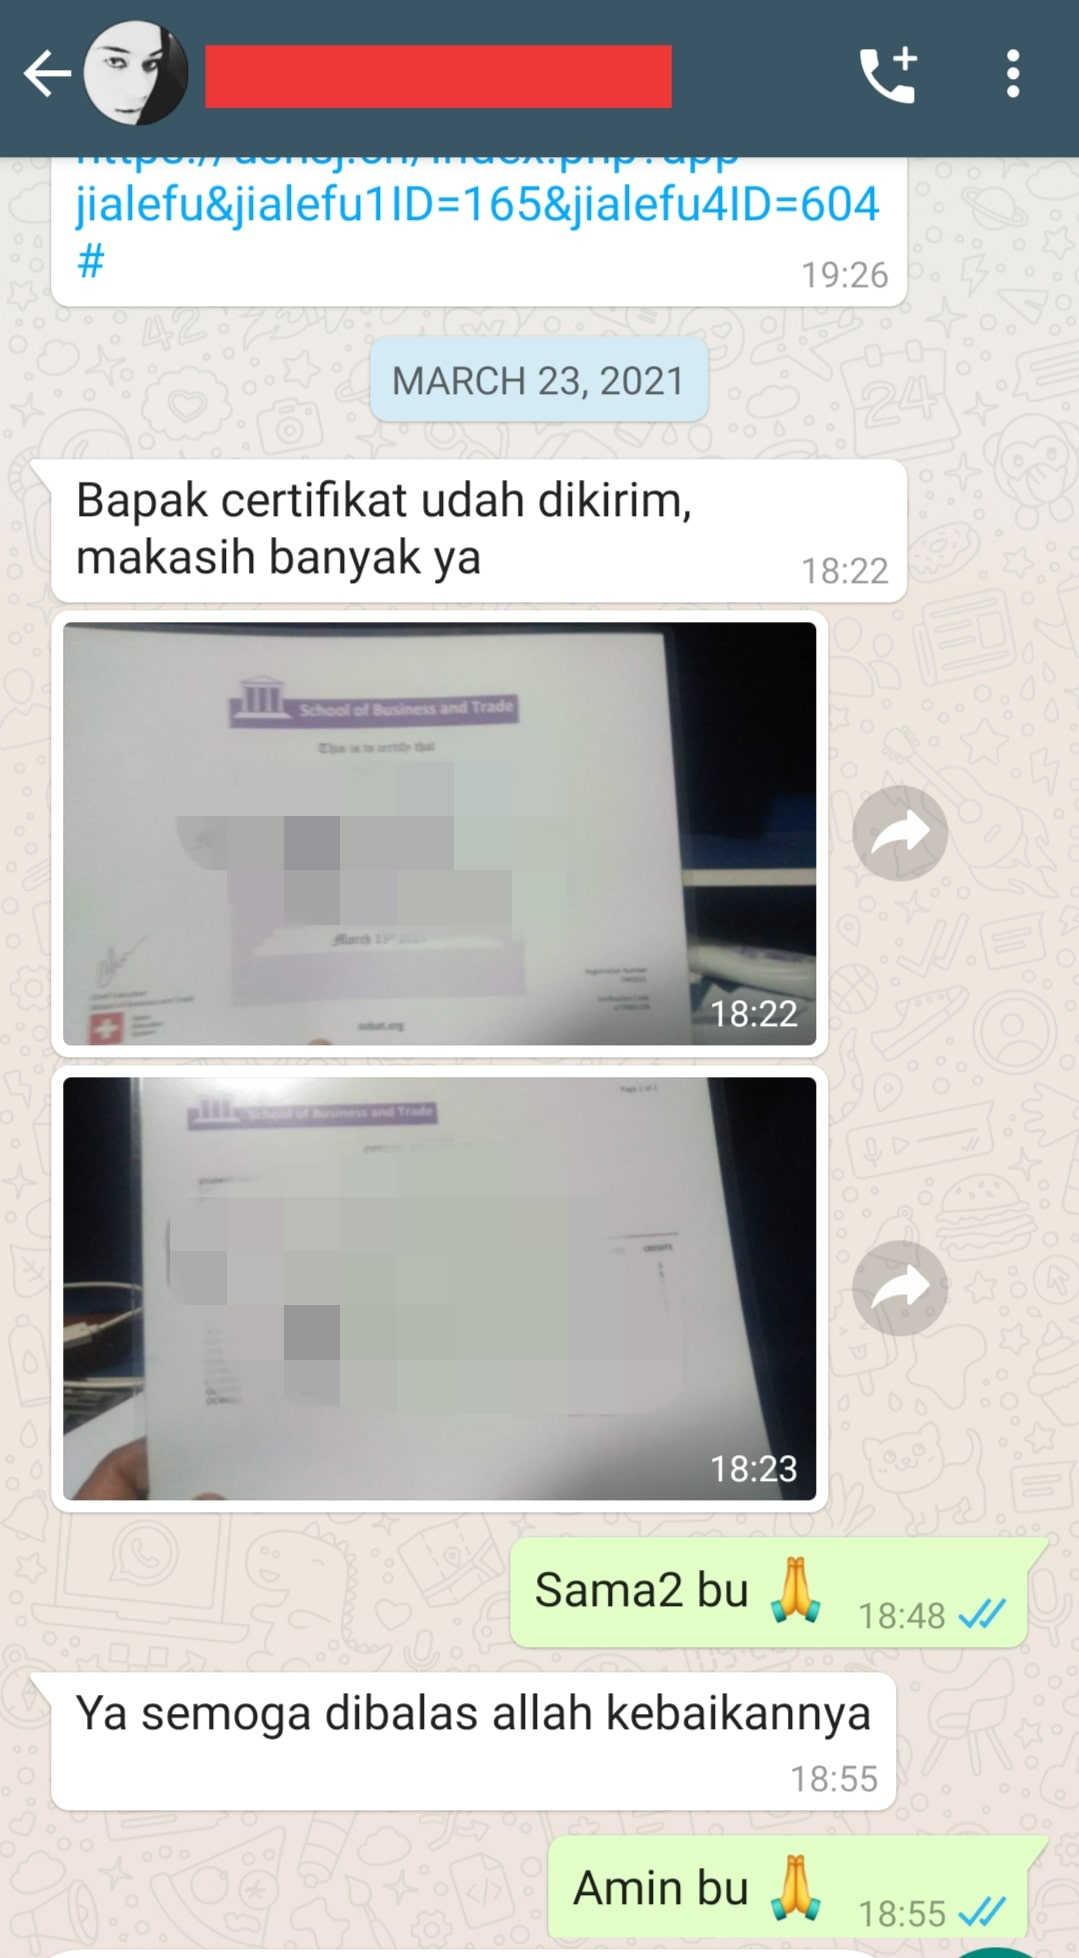 testimoni pembelian sertifikat